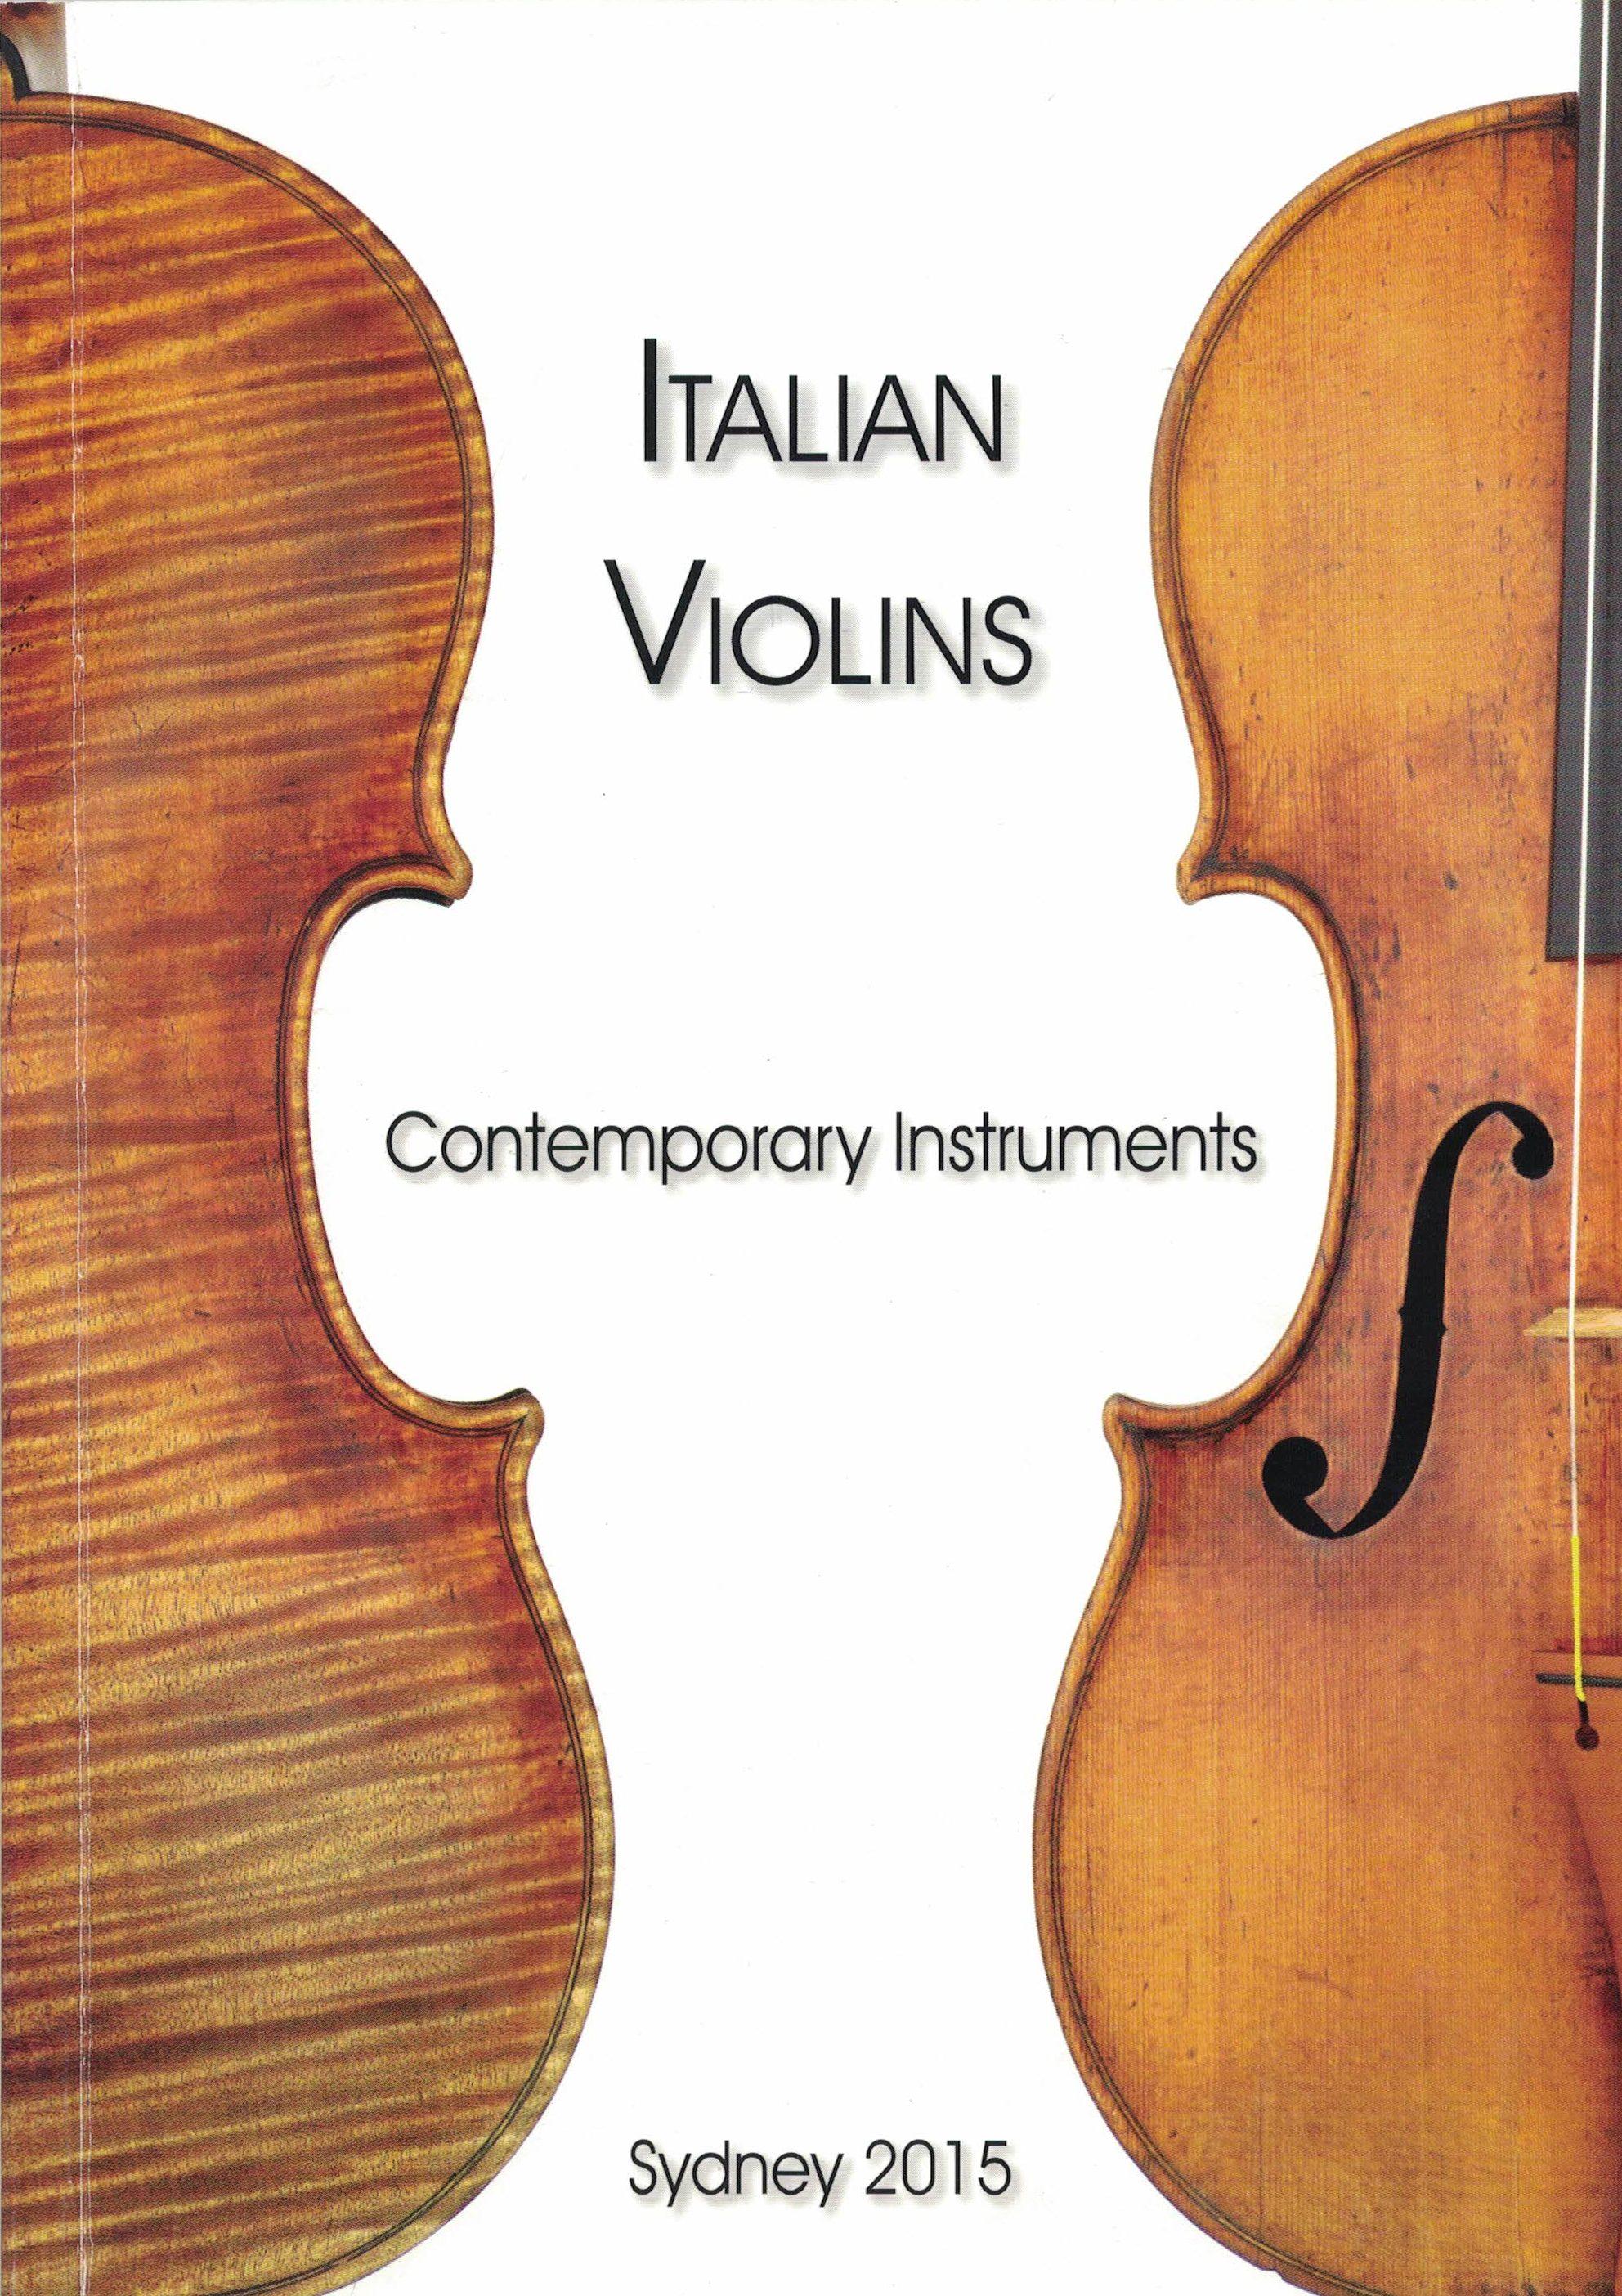 Catalogue 'Italian Violins'